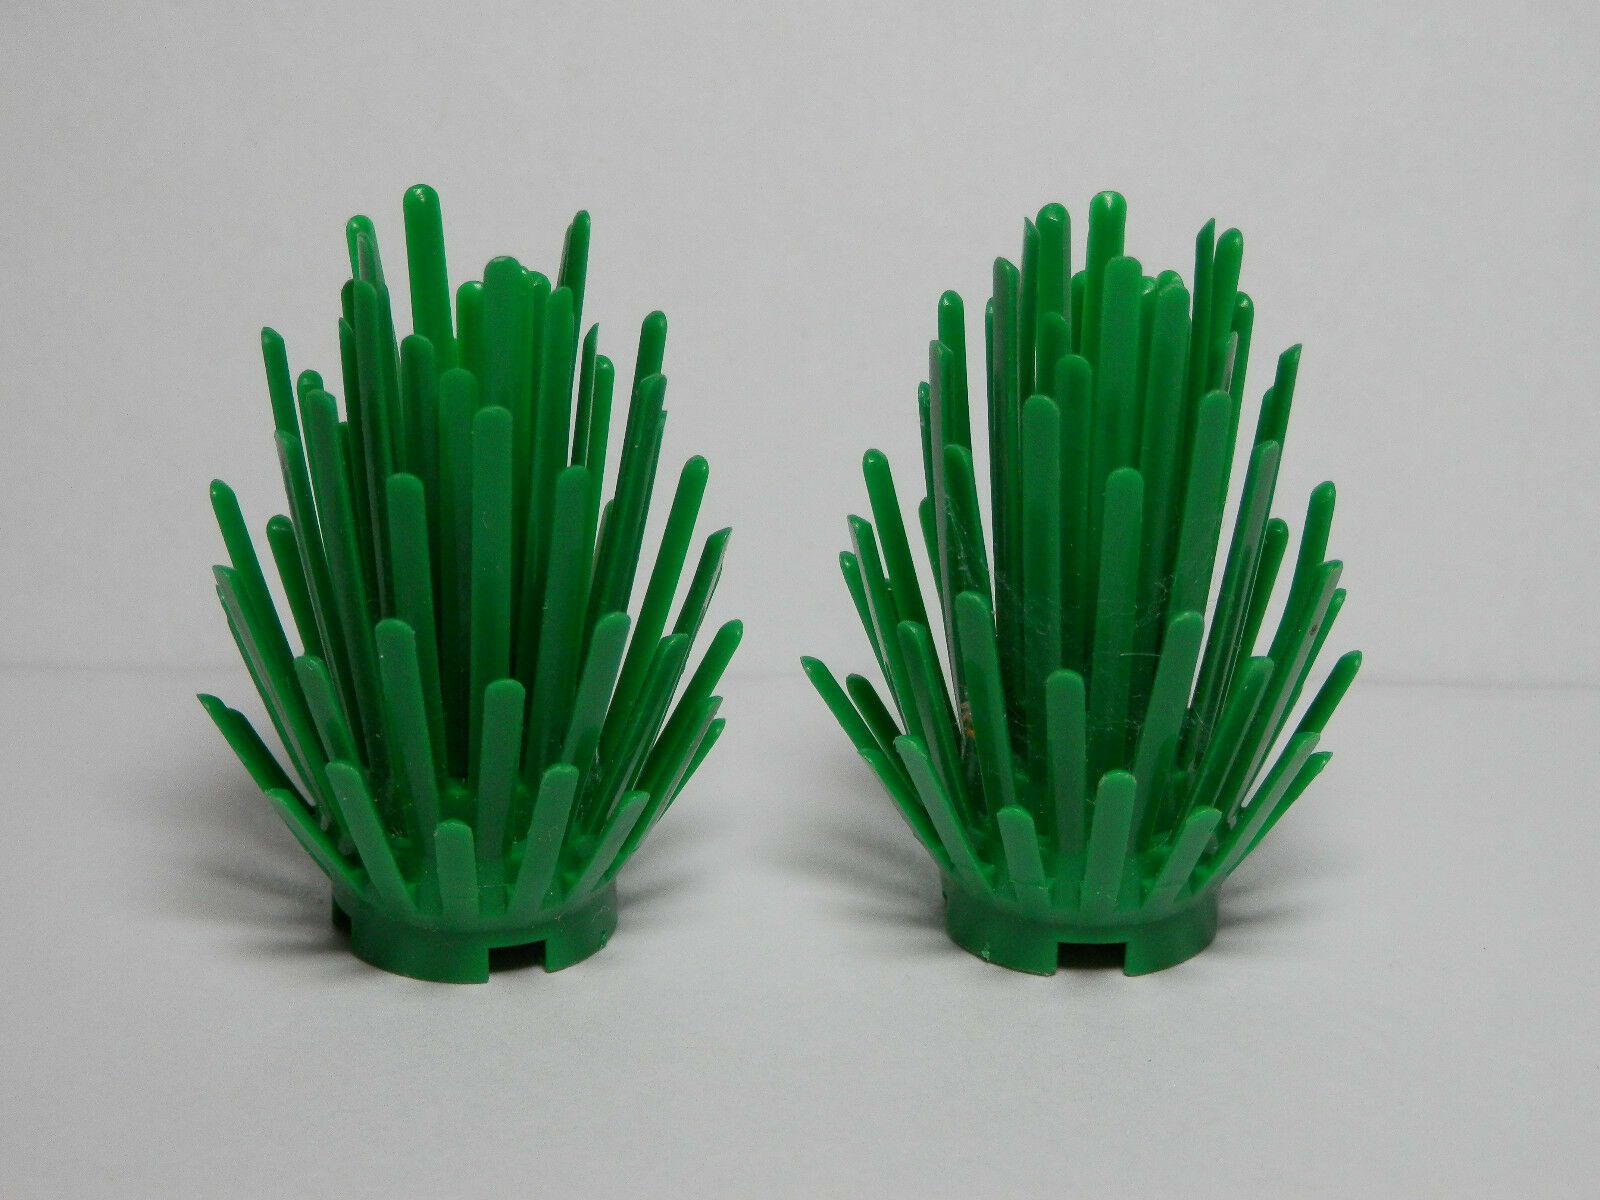 LEGO 6064 Plant Prickly Bush 2 x 2 x 4 choose color